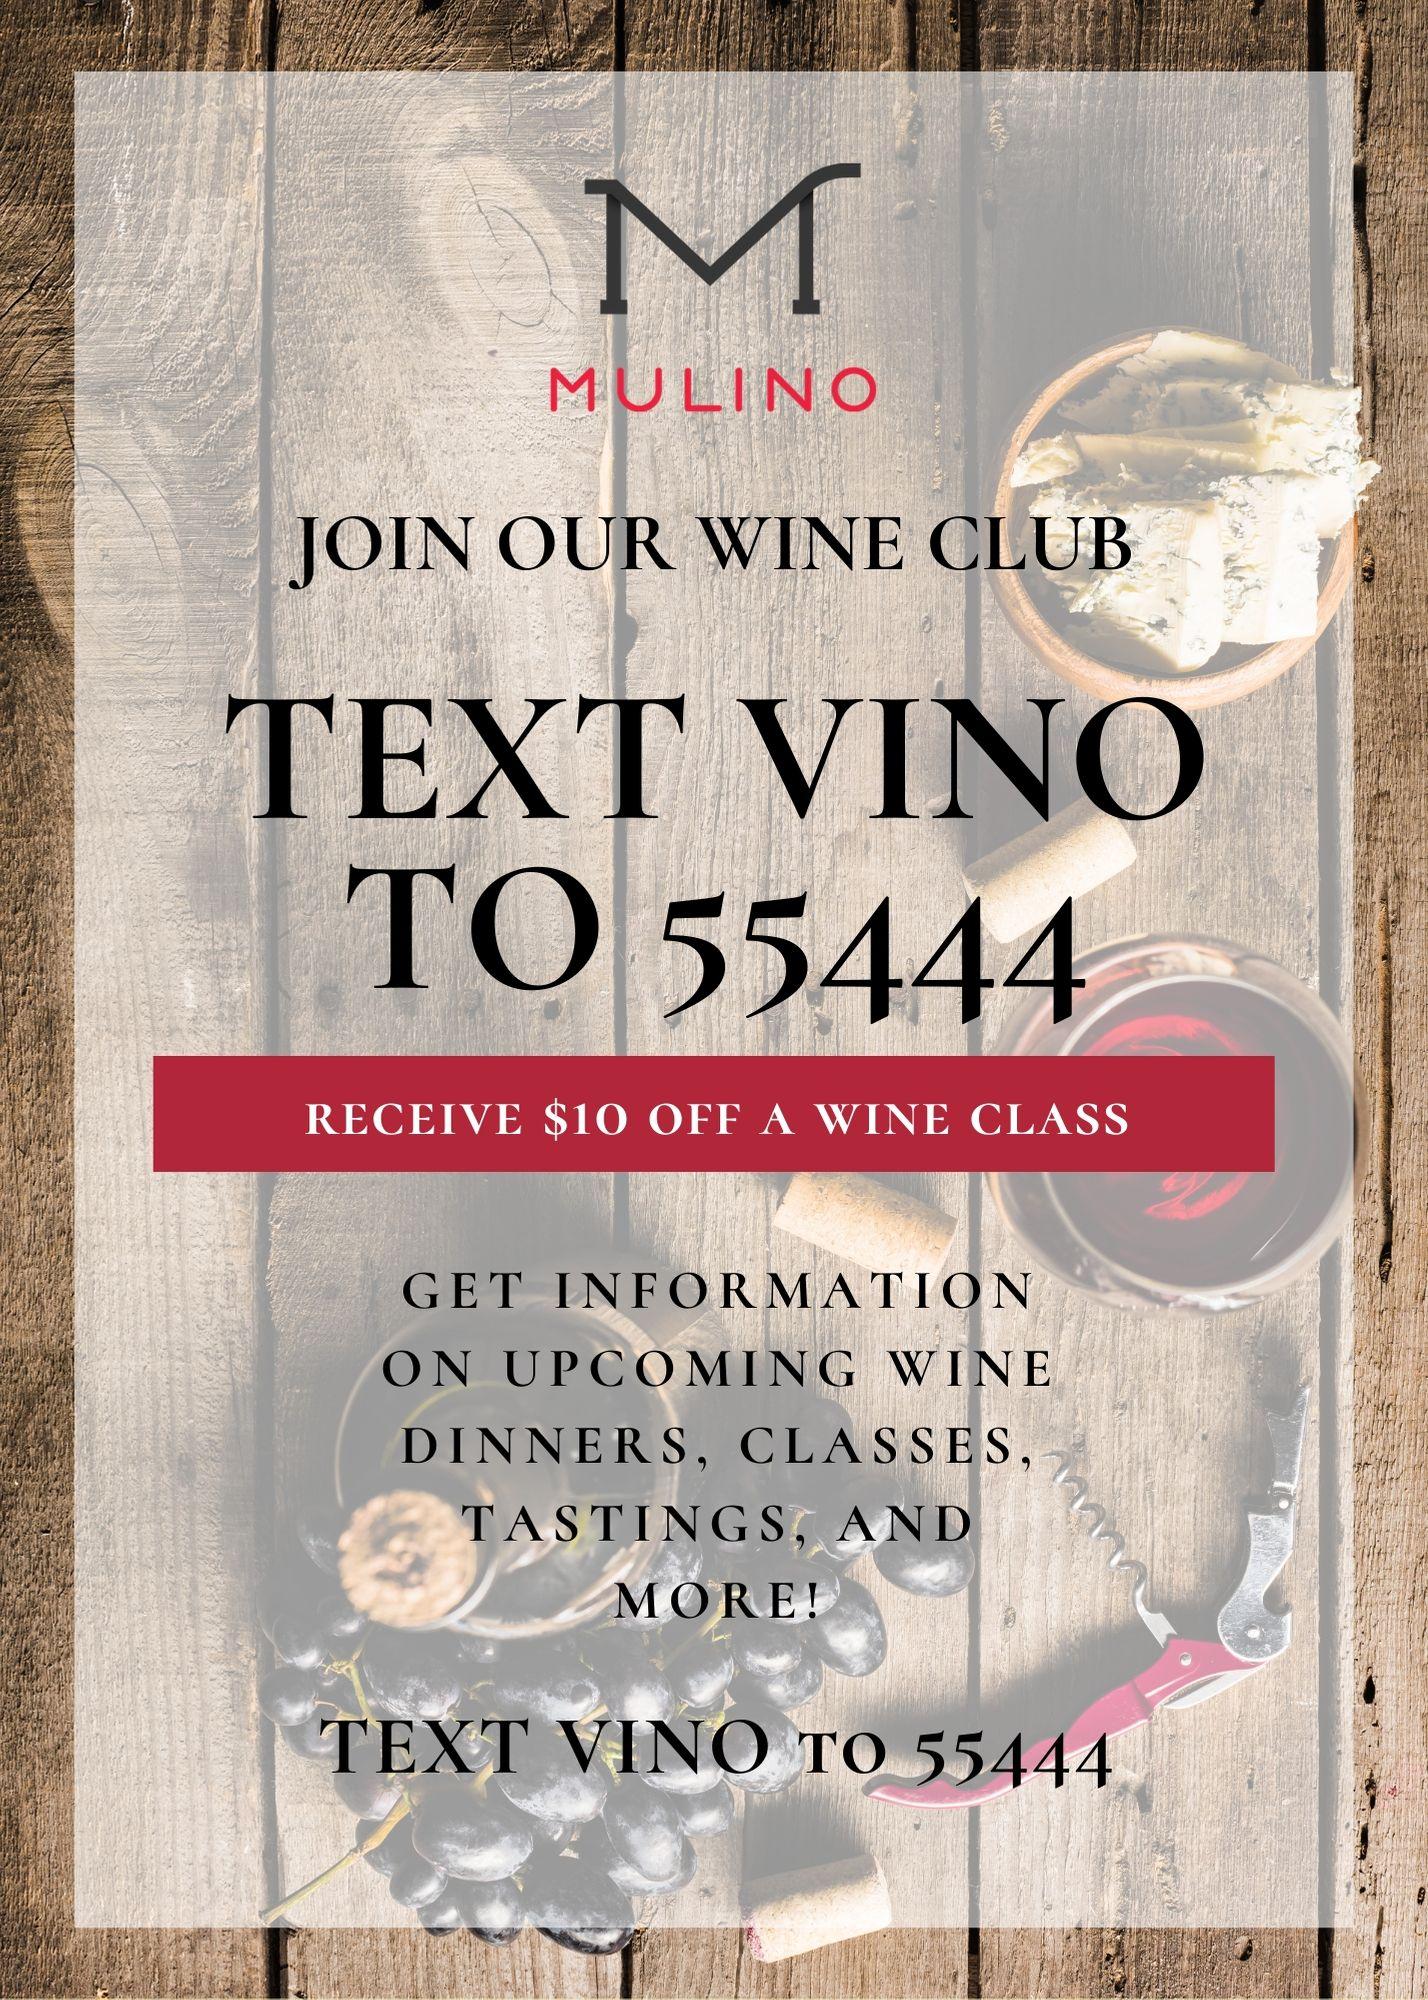 Join the Mulino Wine Club